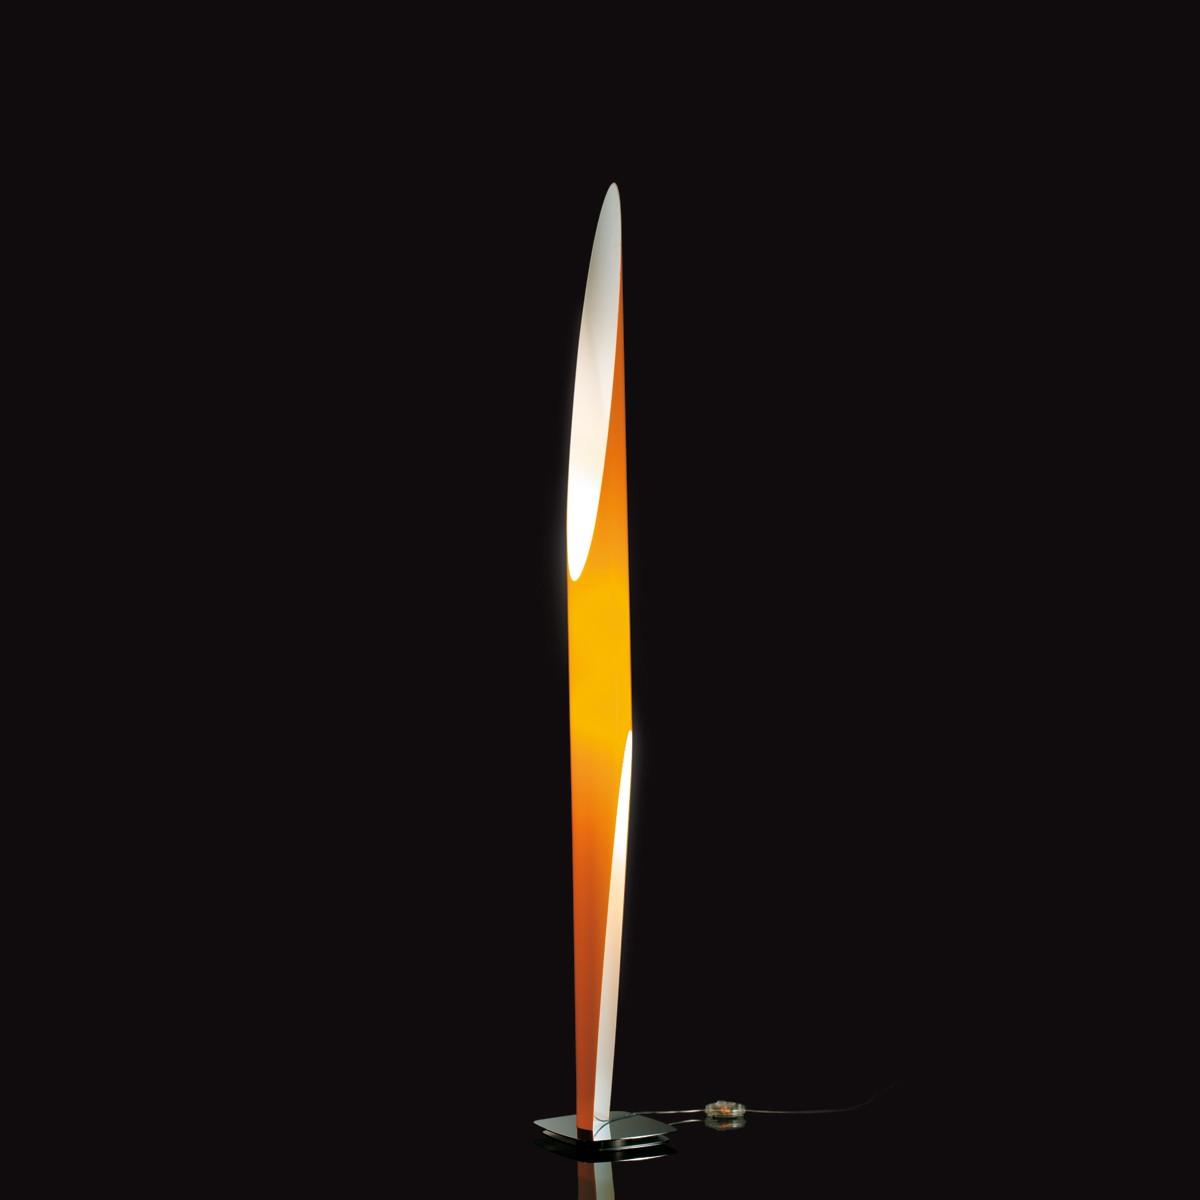 Kundalini Shakti 200 Stehleuchte, orange, Basis: Edelstahl satiniert